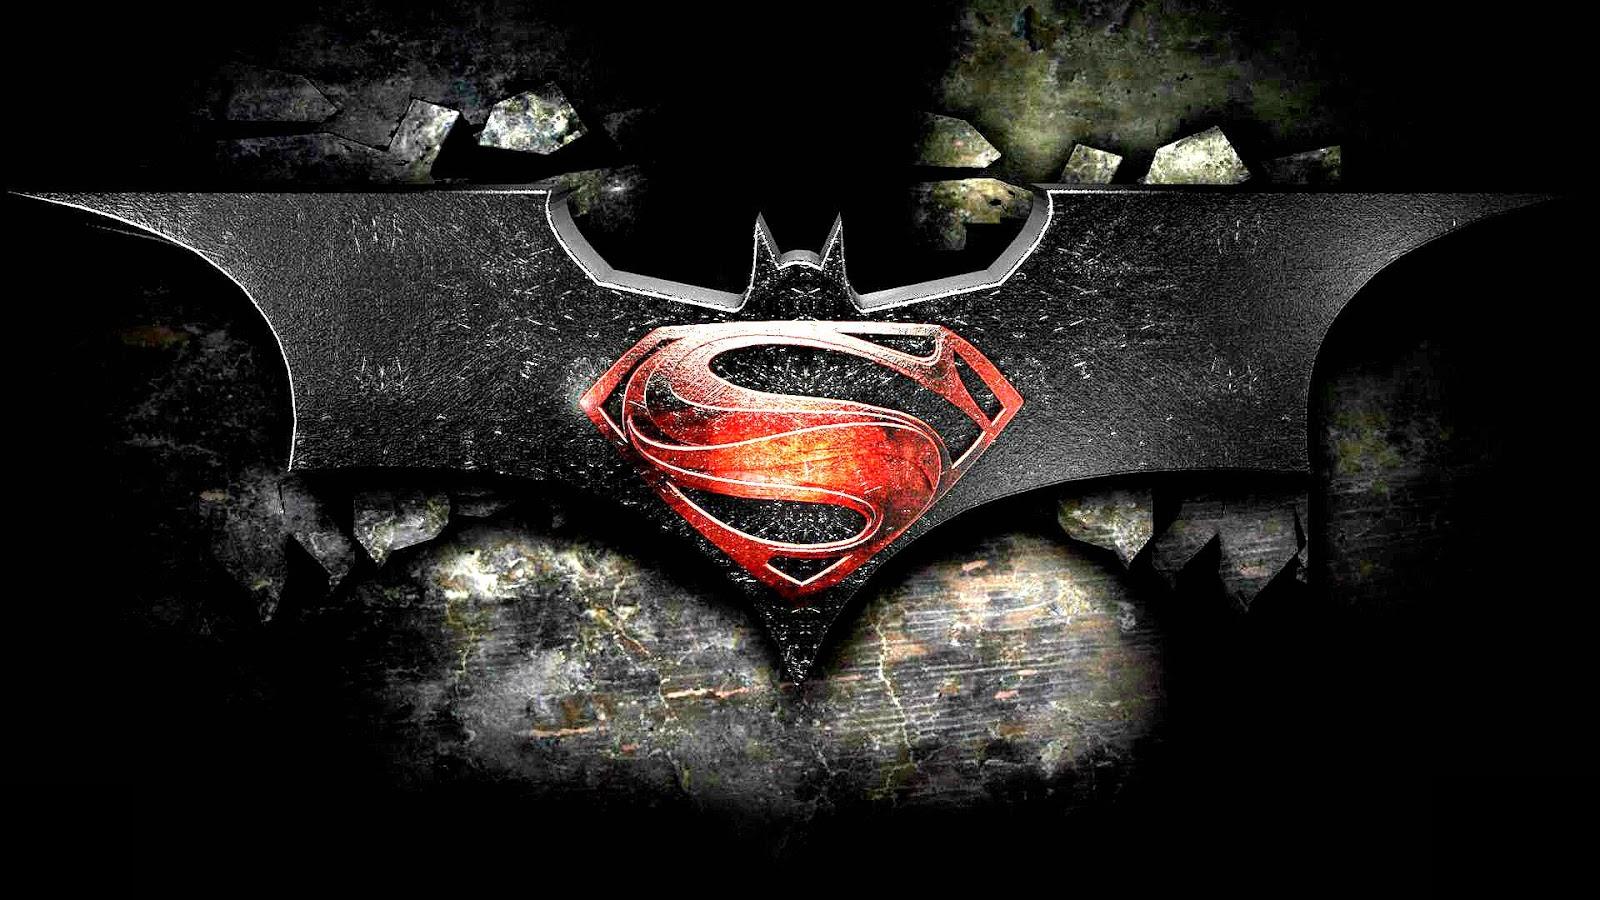 superman dawn of justice Full HD wallpapers 2016 HD WALLPAPER WIDE 1600x900